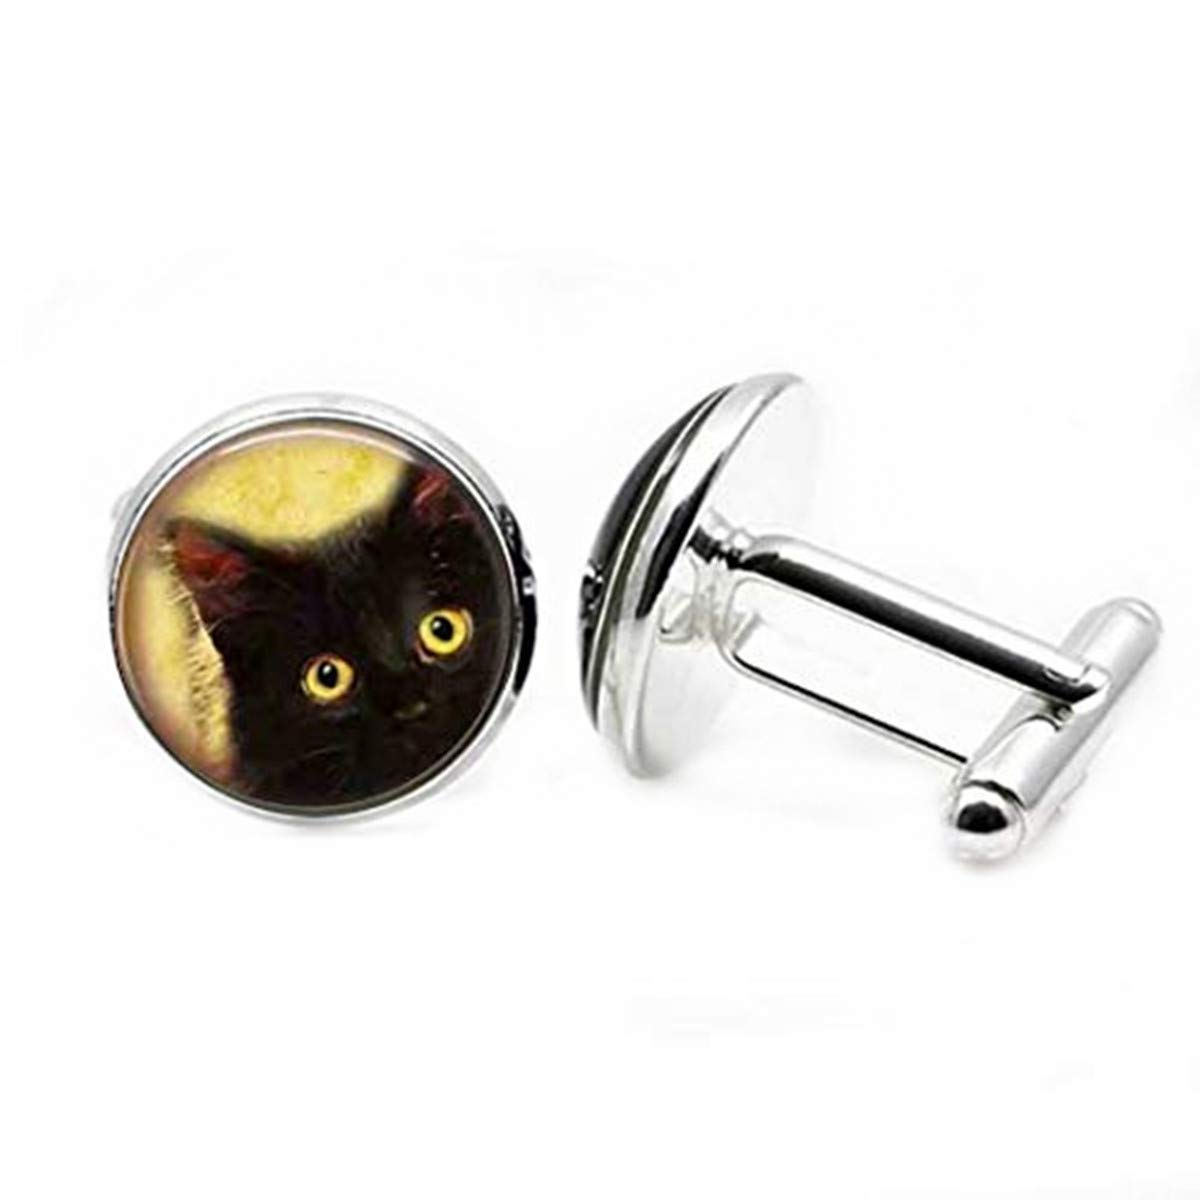 Dandelion Innocent Cat on a Monochrome Background Illustration Cufflinks,Popular Glass Cufflinks,Nice Cufflinks Gift